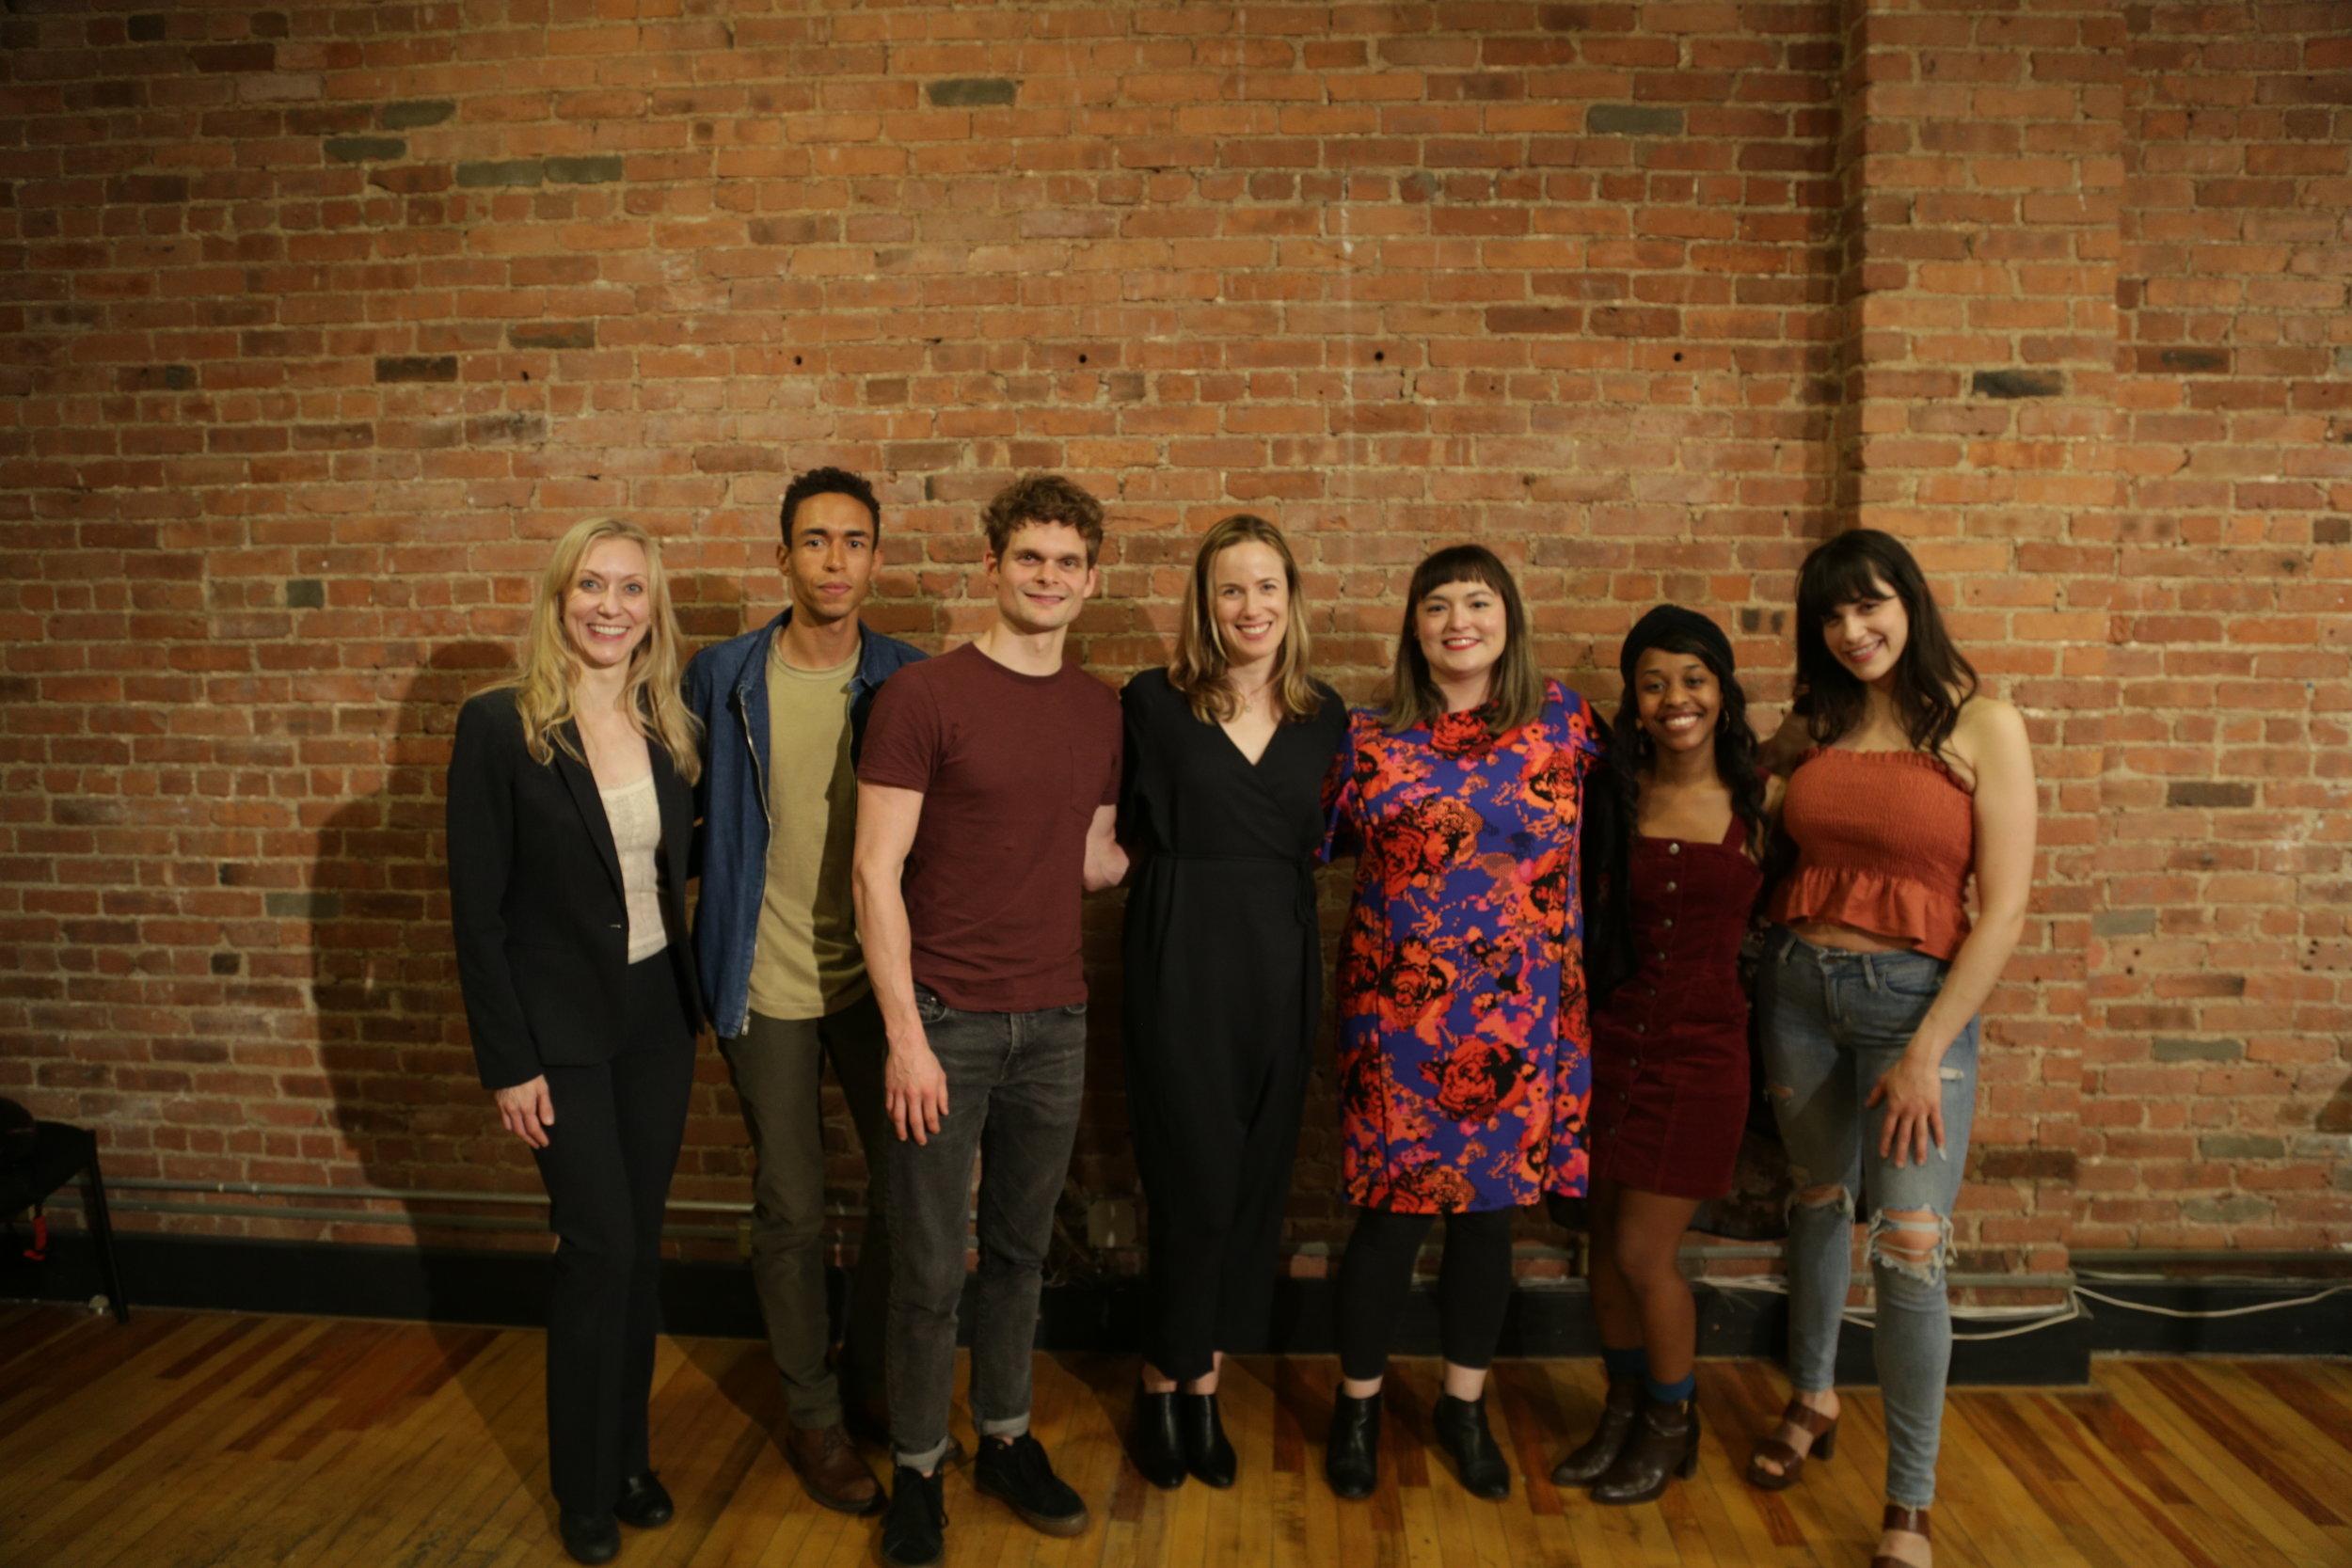 L-R: Tina Benko (Violet); Kyle Beltran (Markus); Andrew Durand (CJ); Sarah Krohn (Director); Amy Gijsbers van Wijk (writer); Mirirai Sithole (Layla); Fig Chilcott (Allison)